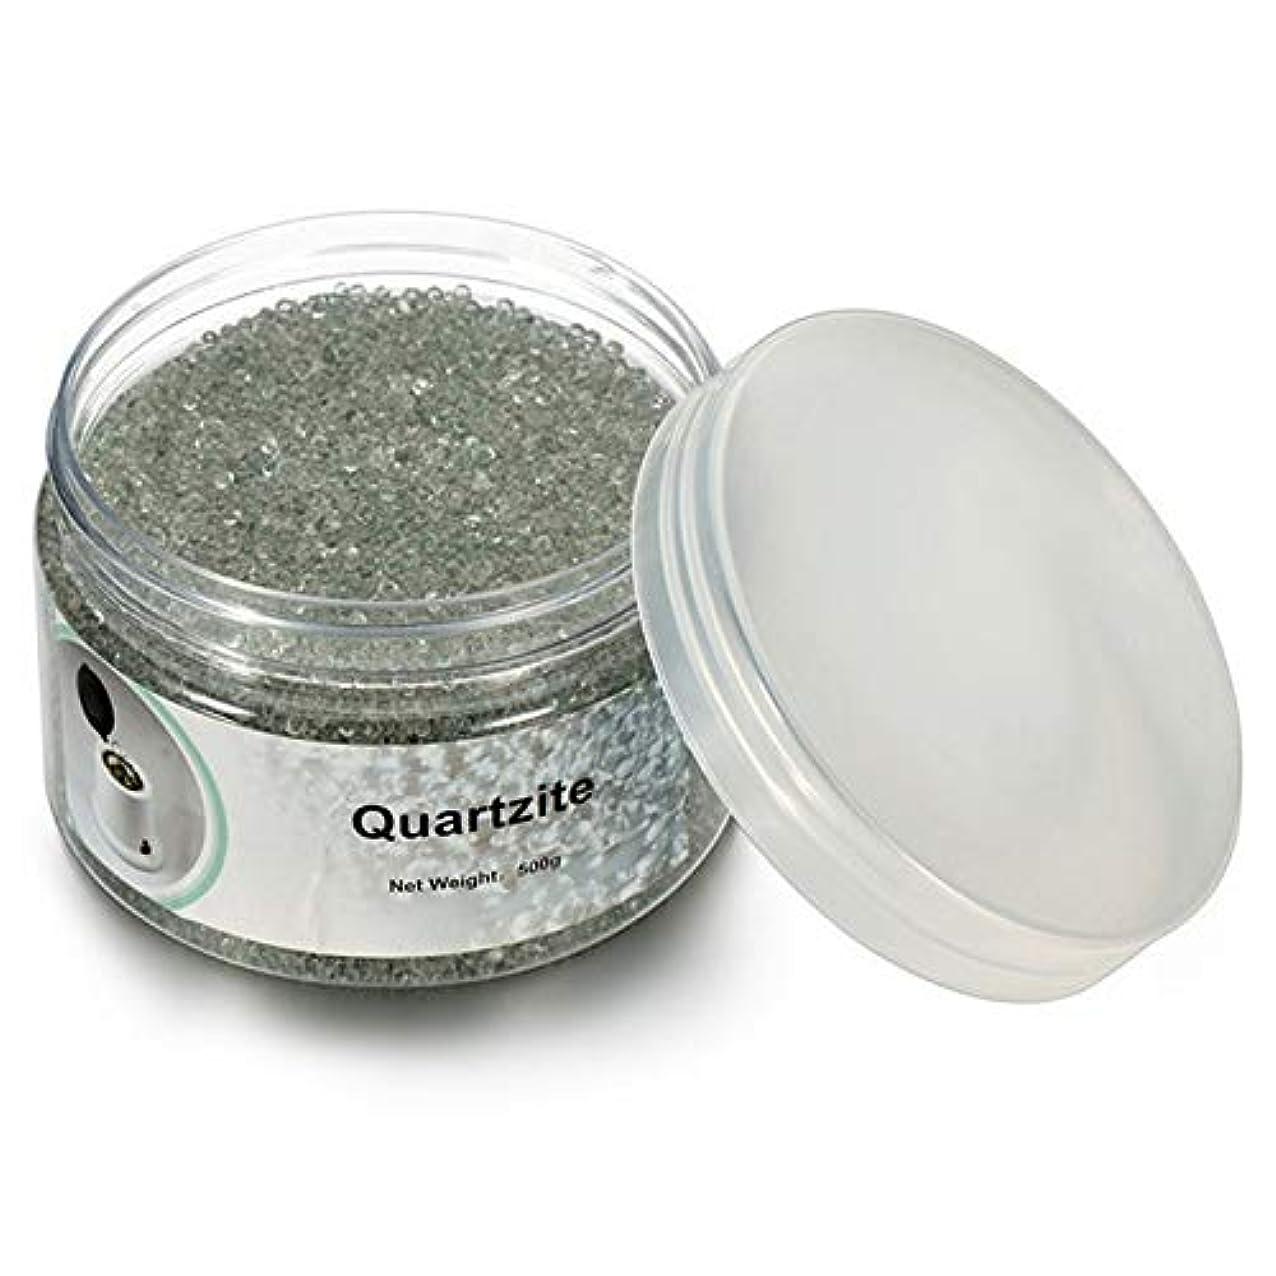 RETYLY 500G石英砂消毒ビーズ、理髪と美容ネイルツールの消毒用